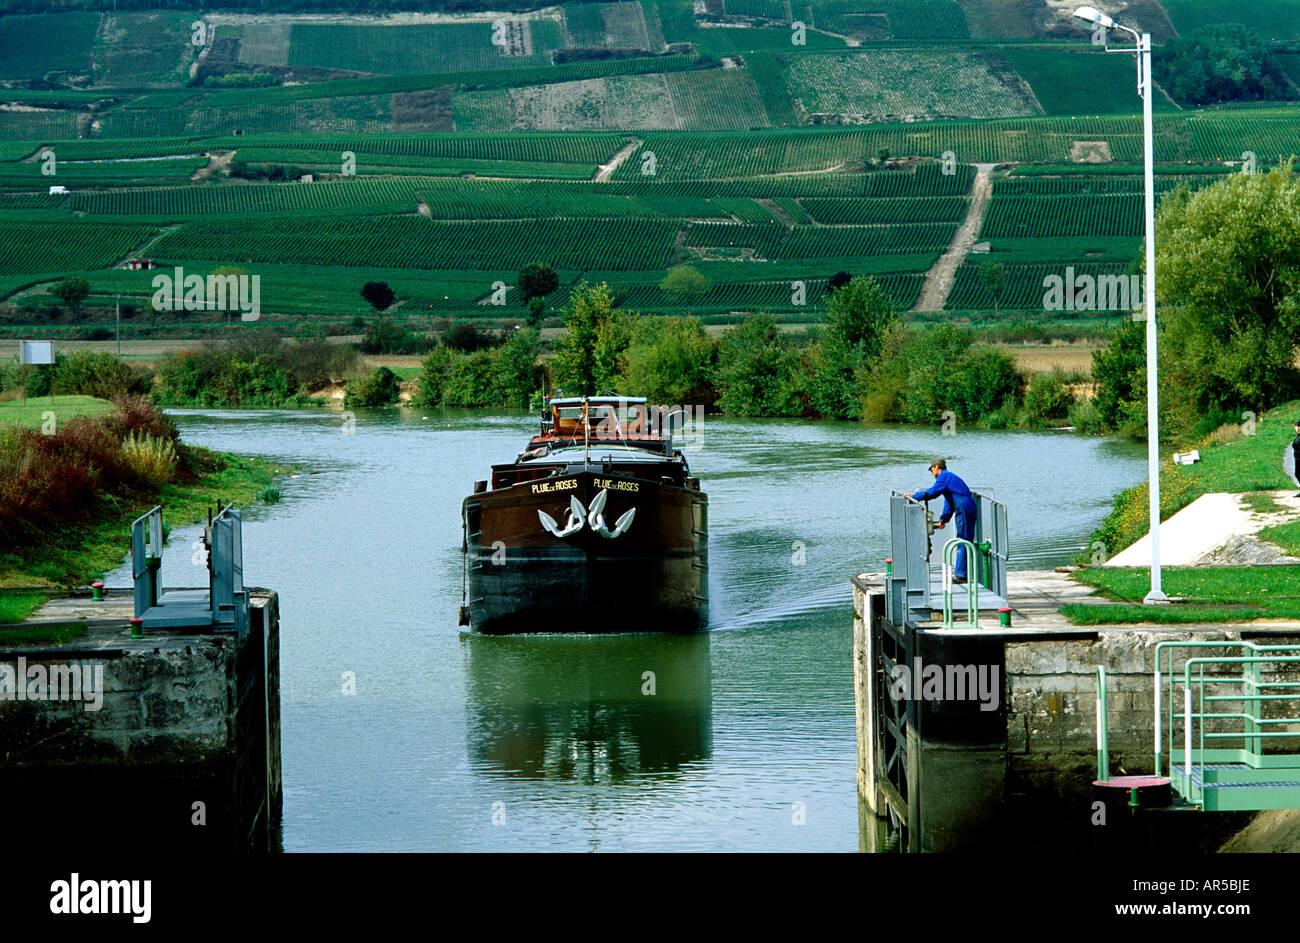 France Champagne District Canal de la Marne at Ecluse des Vaudières. Freighter passing Paris to Reims. Champagne vineyards - Stock Image